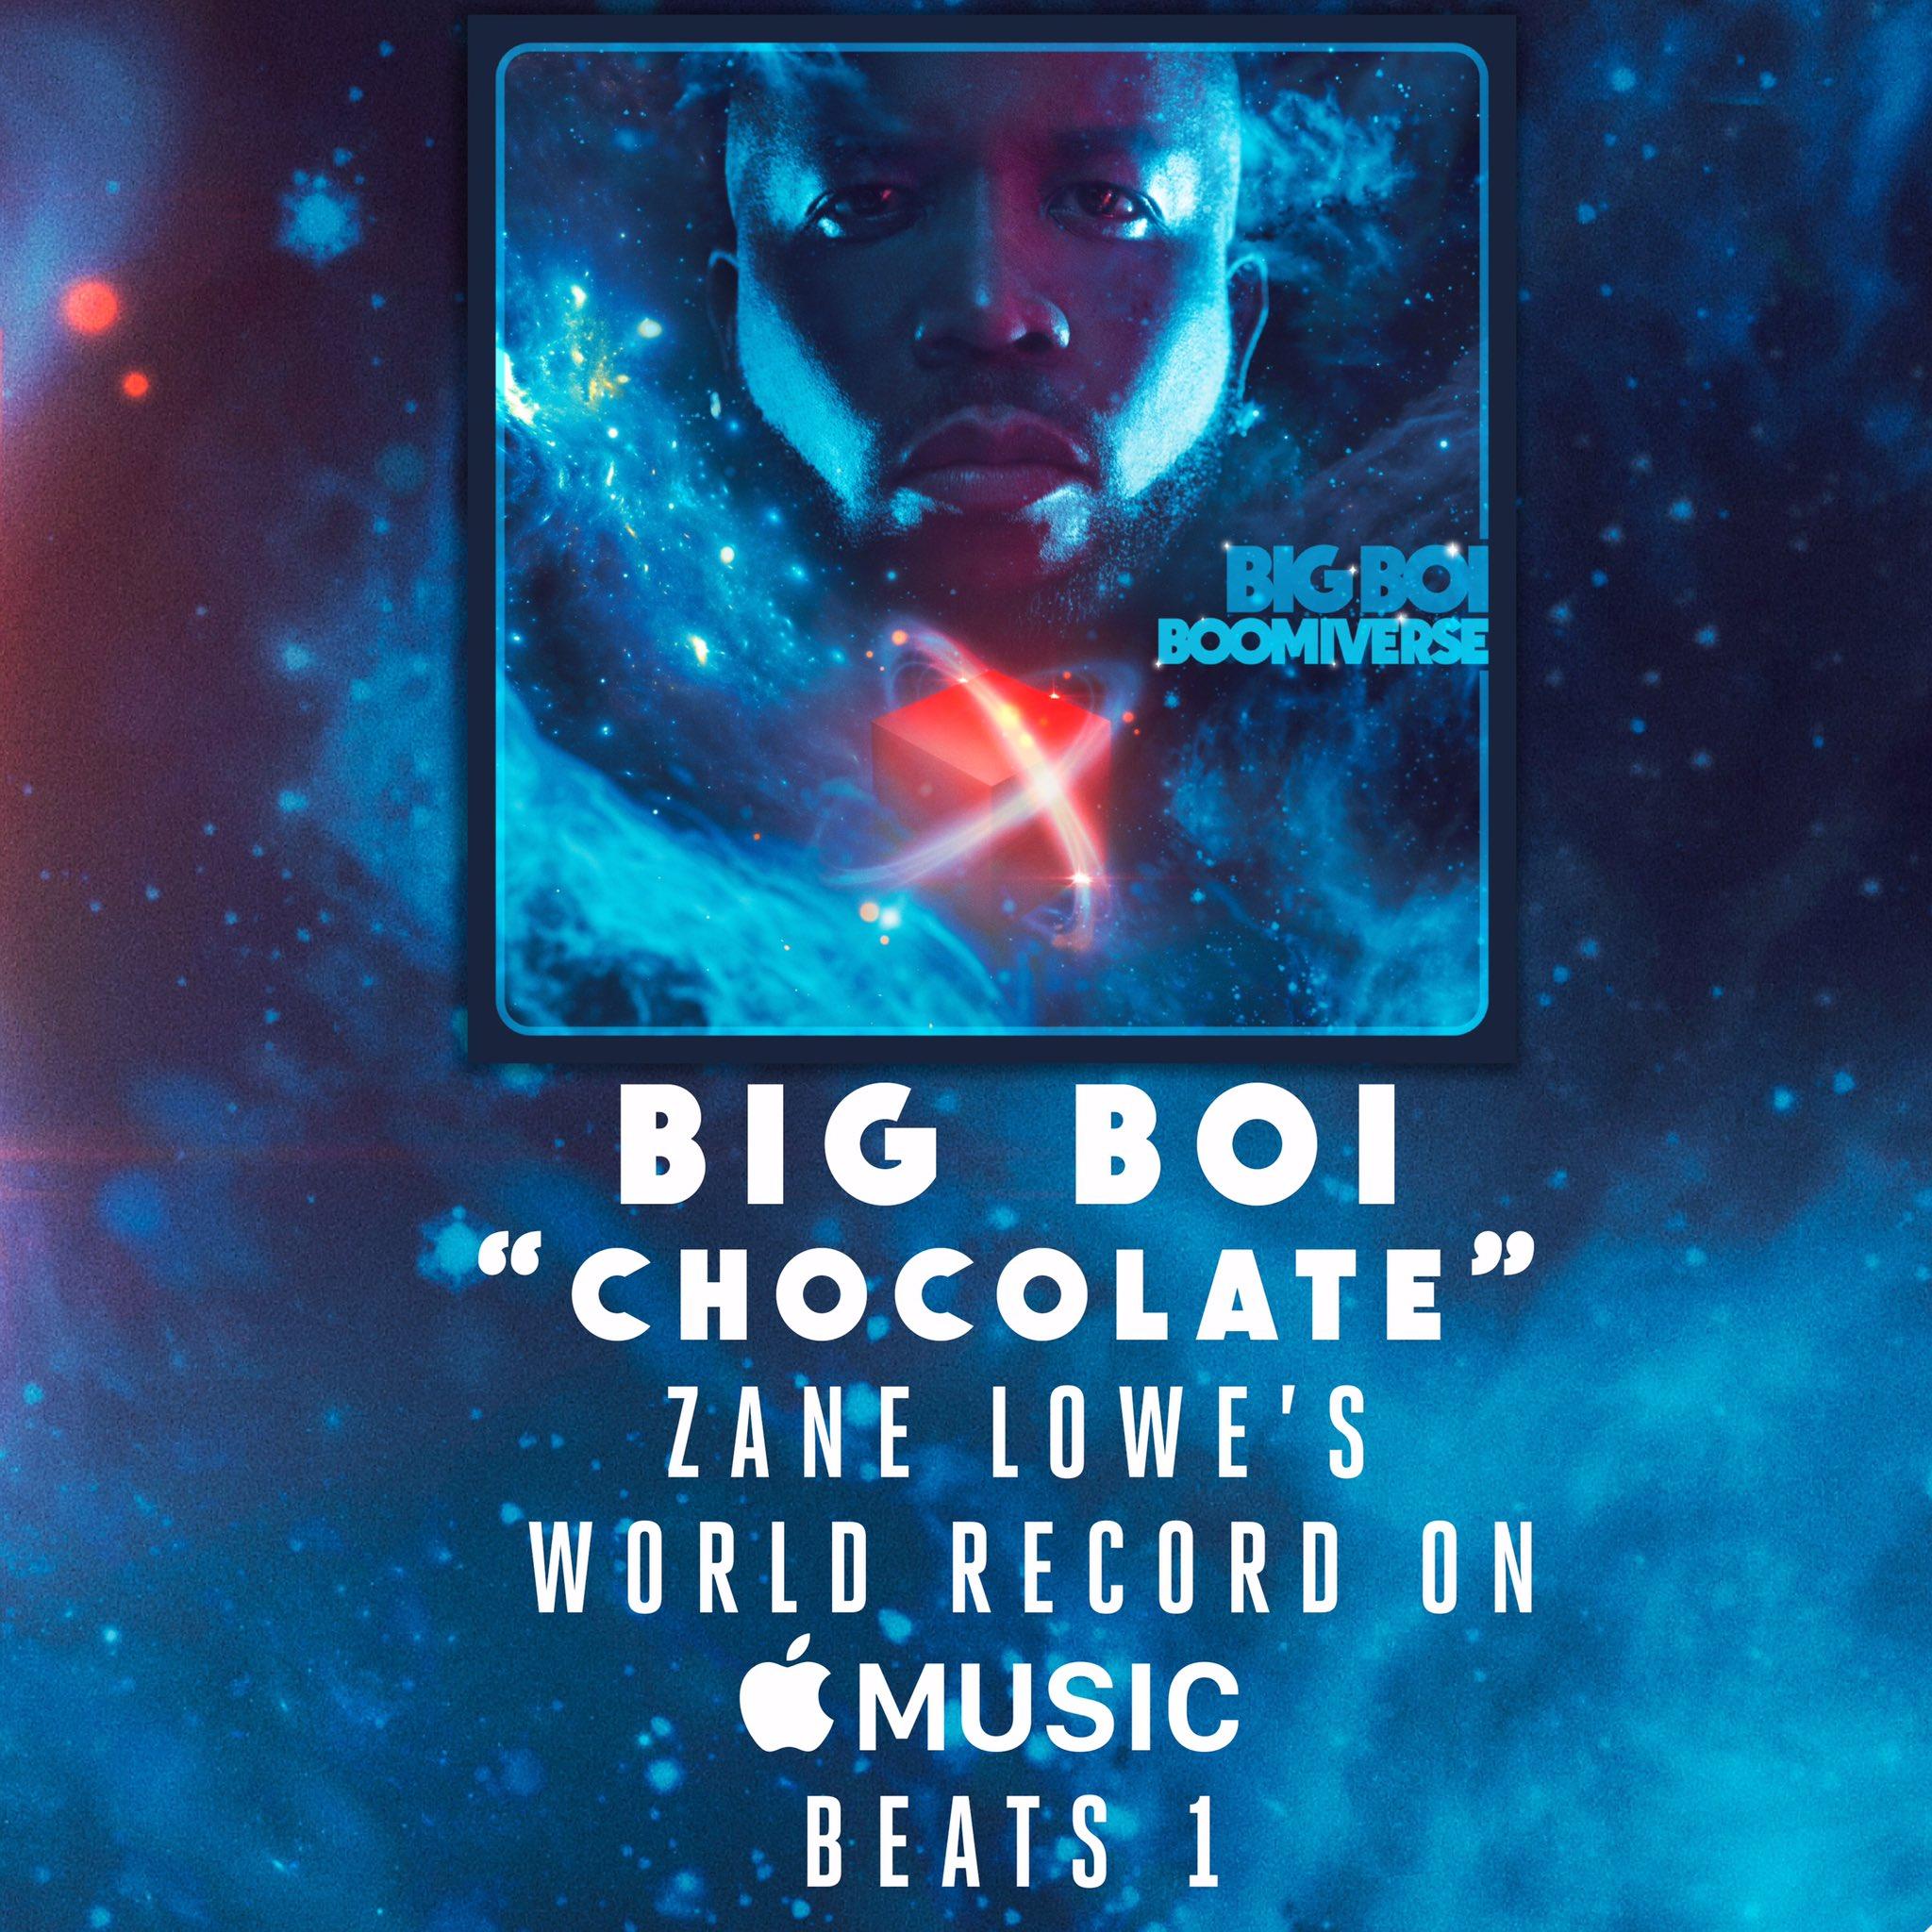 #CHOCOLATE���� @BigBoi @zanelowe #WORLDRECORD on @AppleMusic @Beats1 ��#BOOMIVERSE out this Friday�� https://t.co/DSou9akhI7